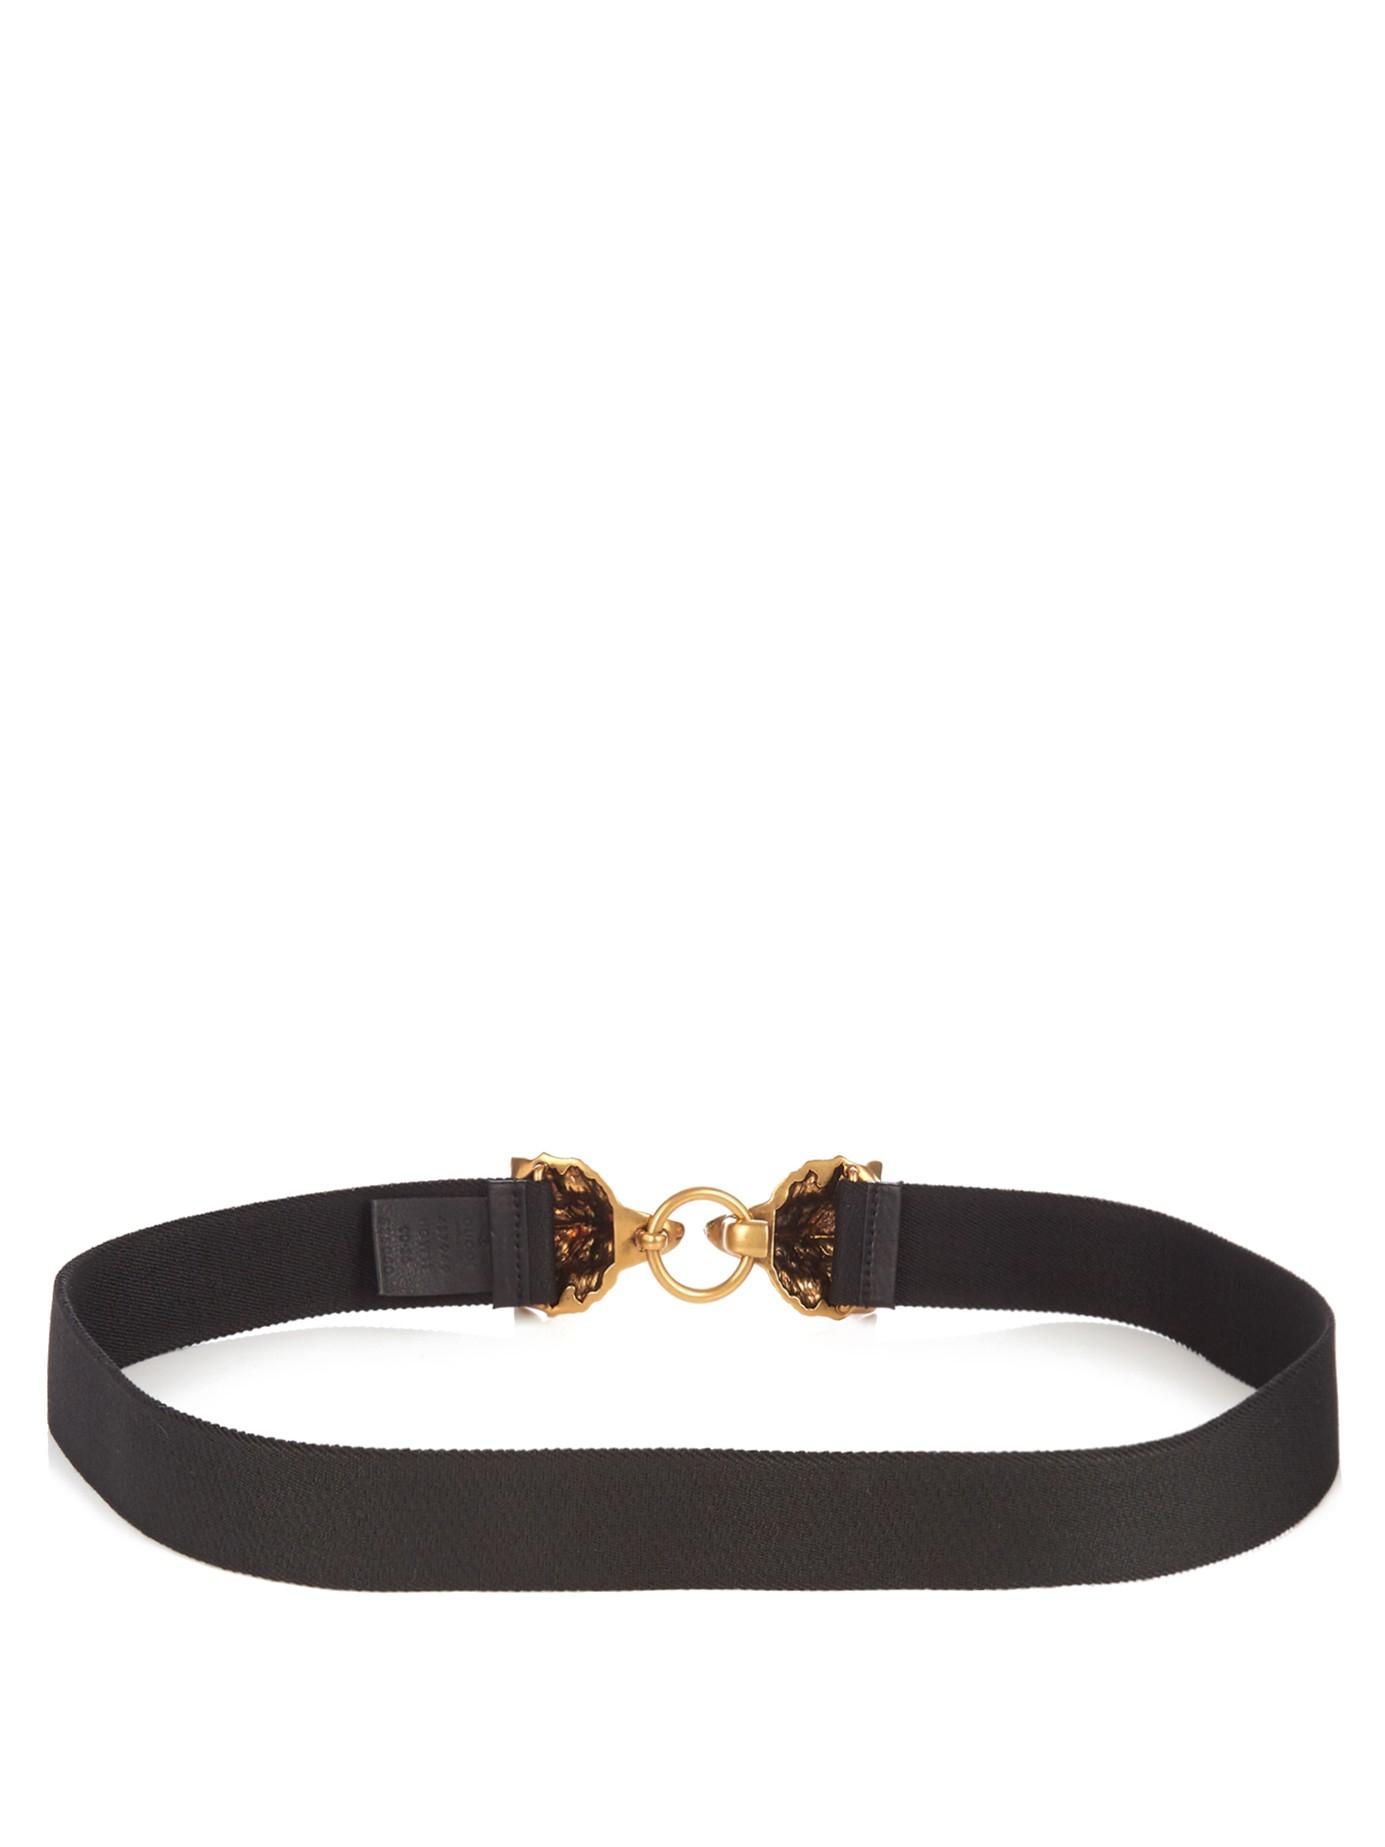 41bd2912029d28 Gucci Wolf-head Elasticated Belt in Black for Men - Lyst